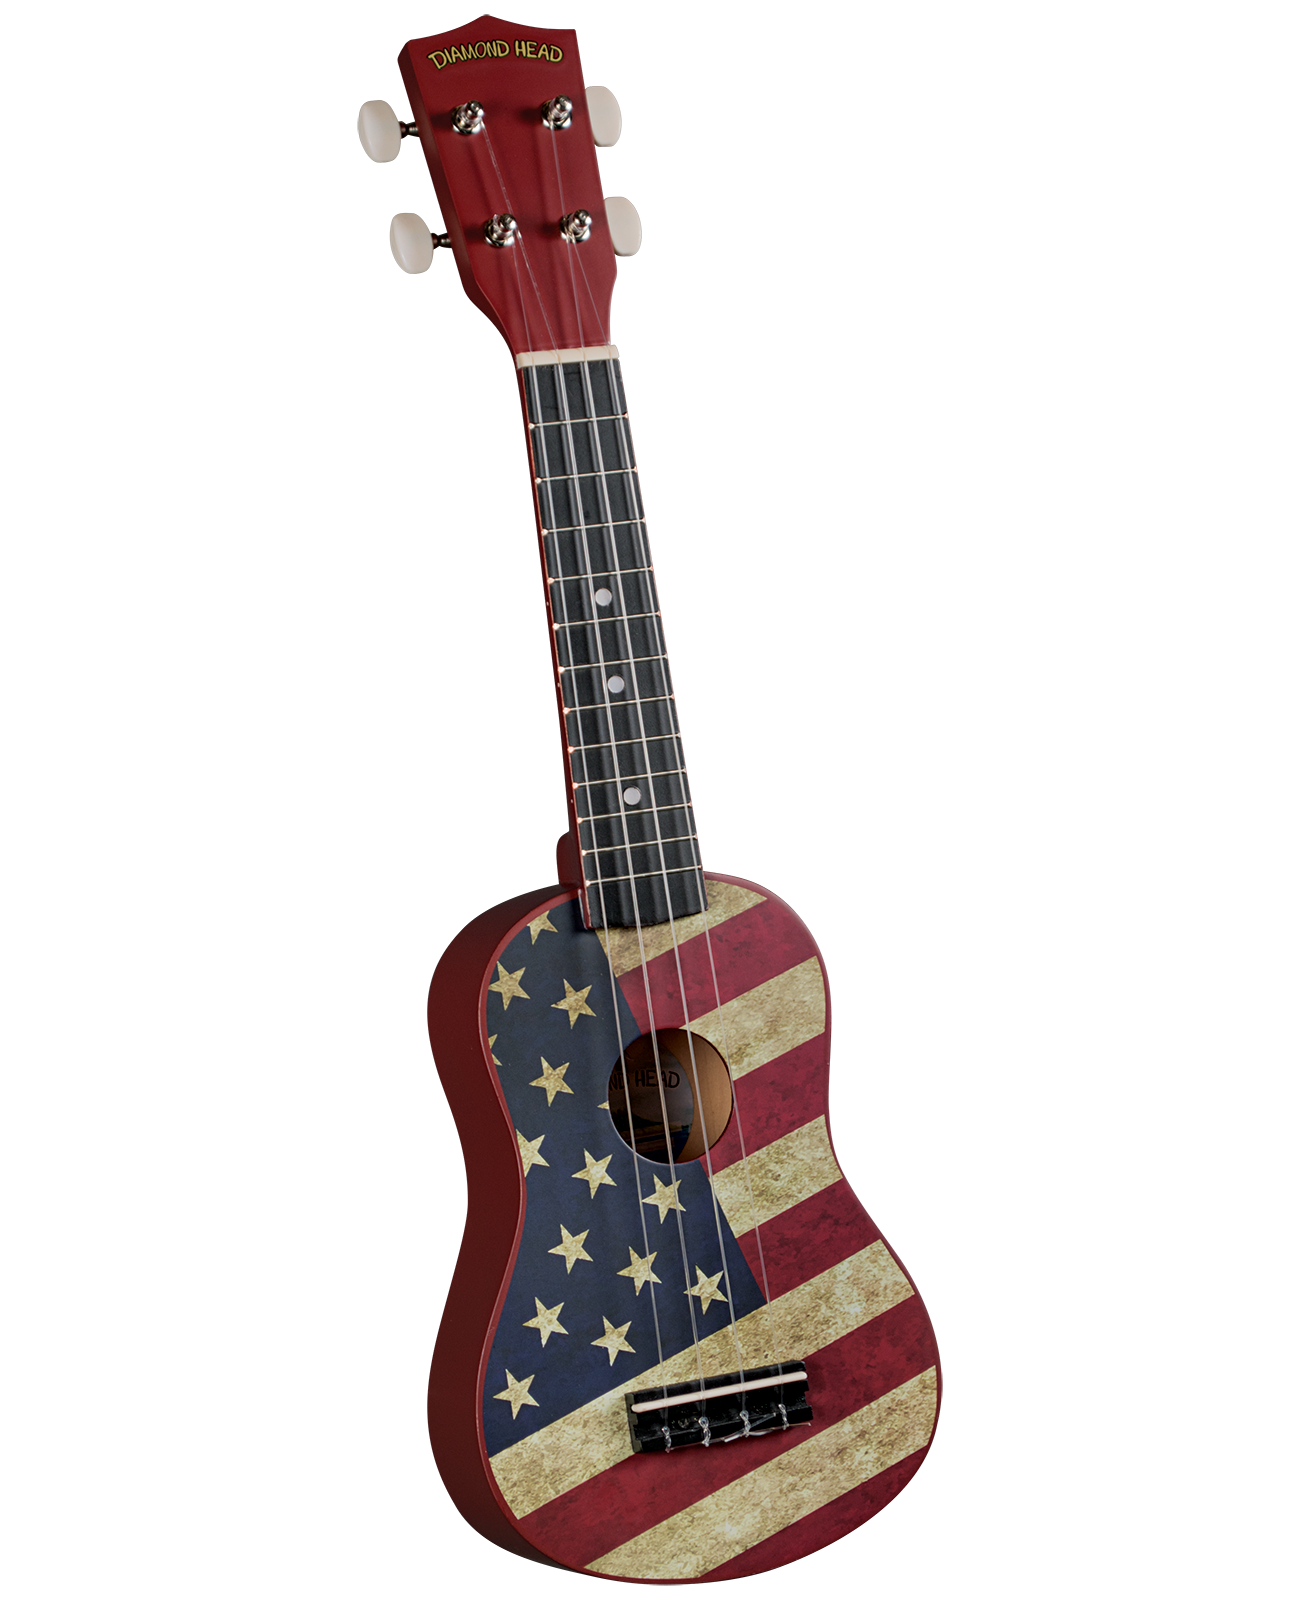 Diamond Head DU-131 Soprano Ukulele w/ Bag- US Flag